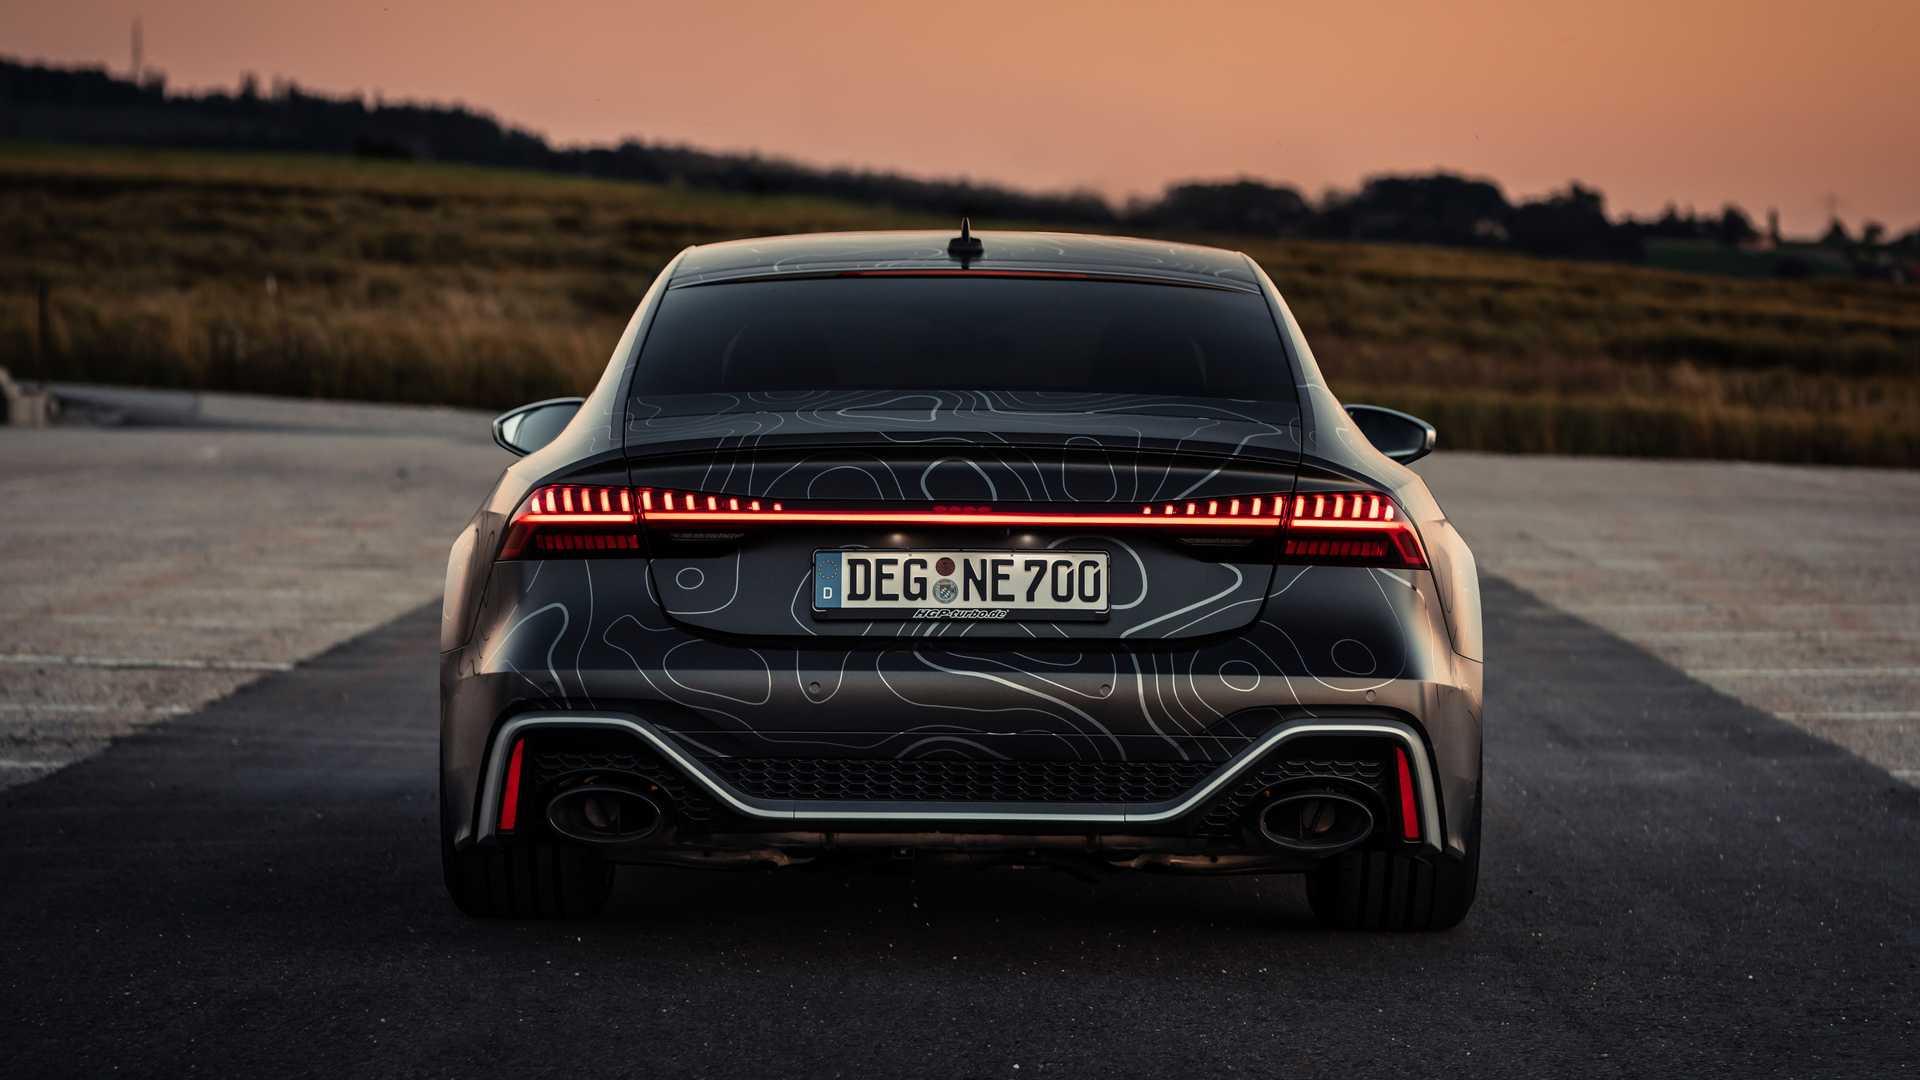 Audi-RS7-By-Black-Box-Richter-14